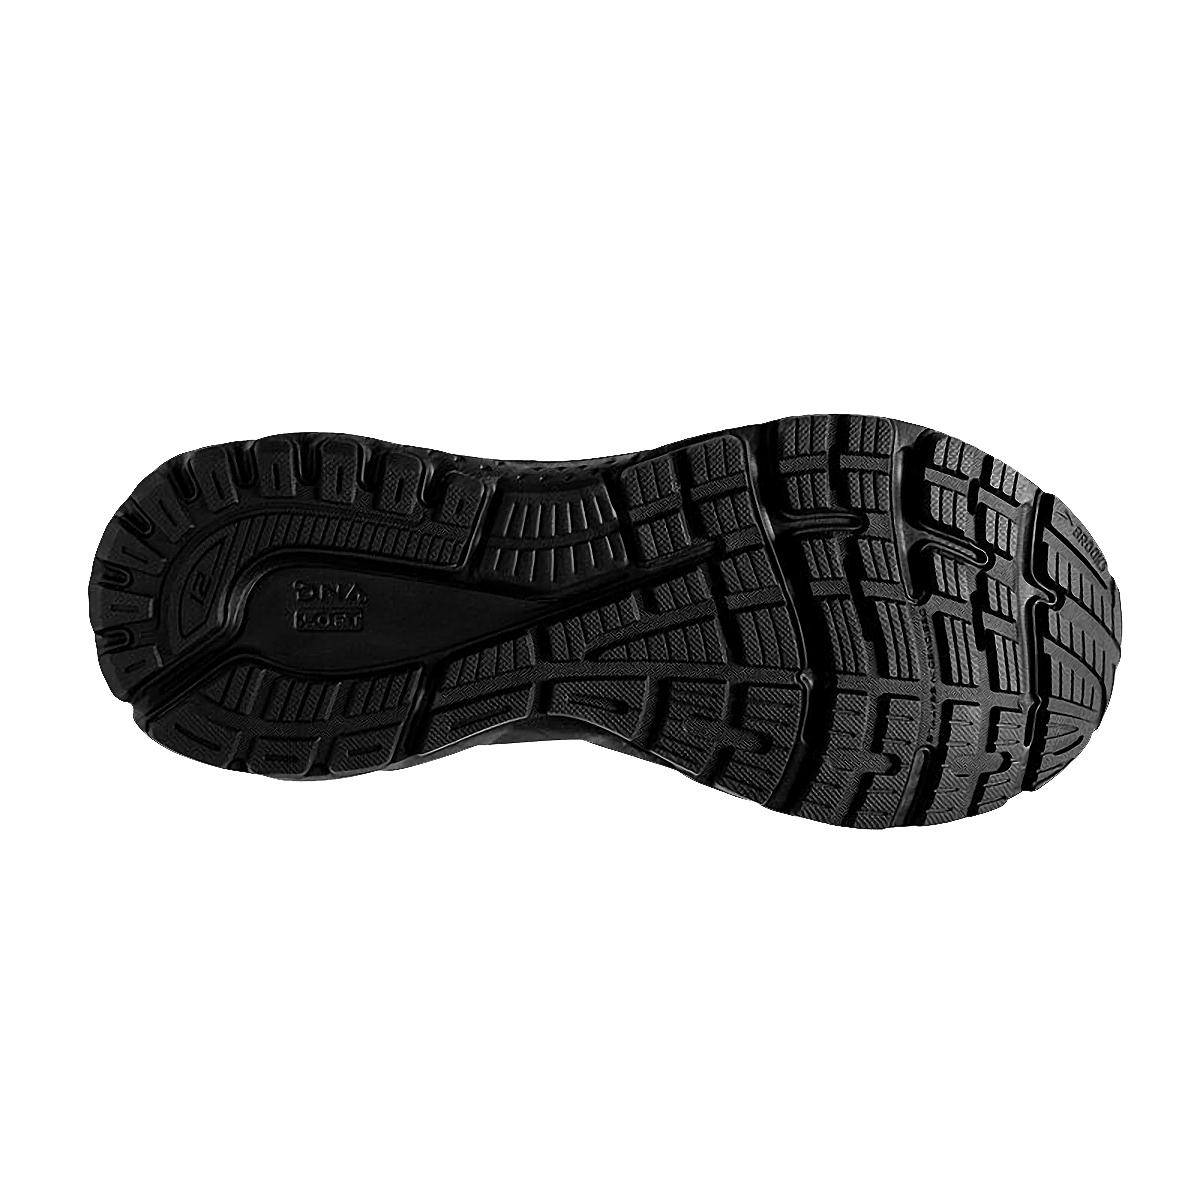 Men's Brooks Adrenaline GTS 21 Running Shoe - Color: Black/Black/Ebony - Size: 7 - Width: Regular, Black/Black/Ebony, large, image 4